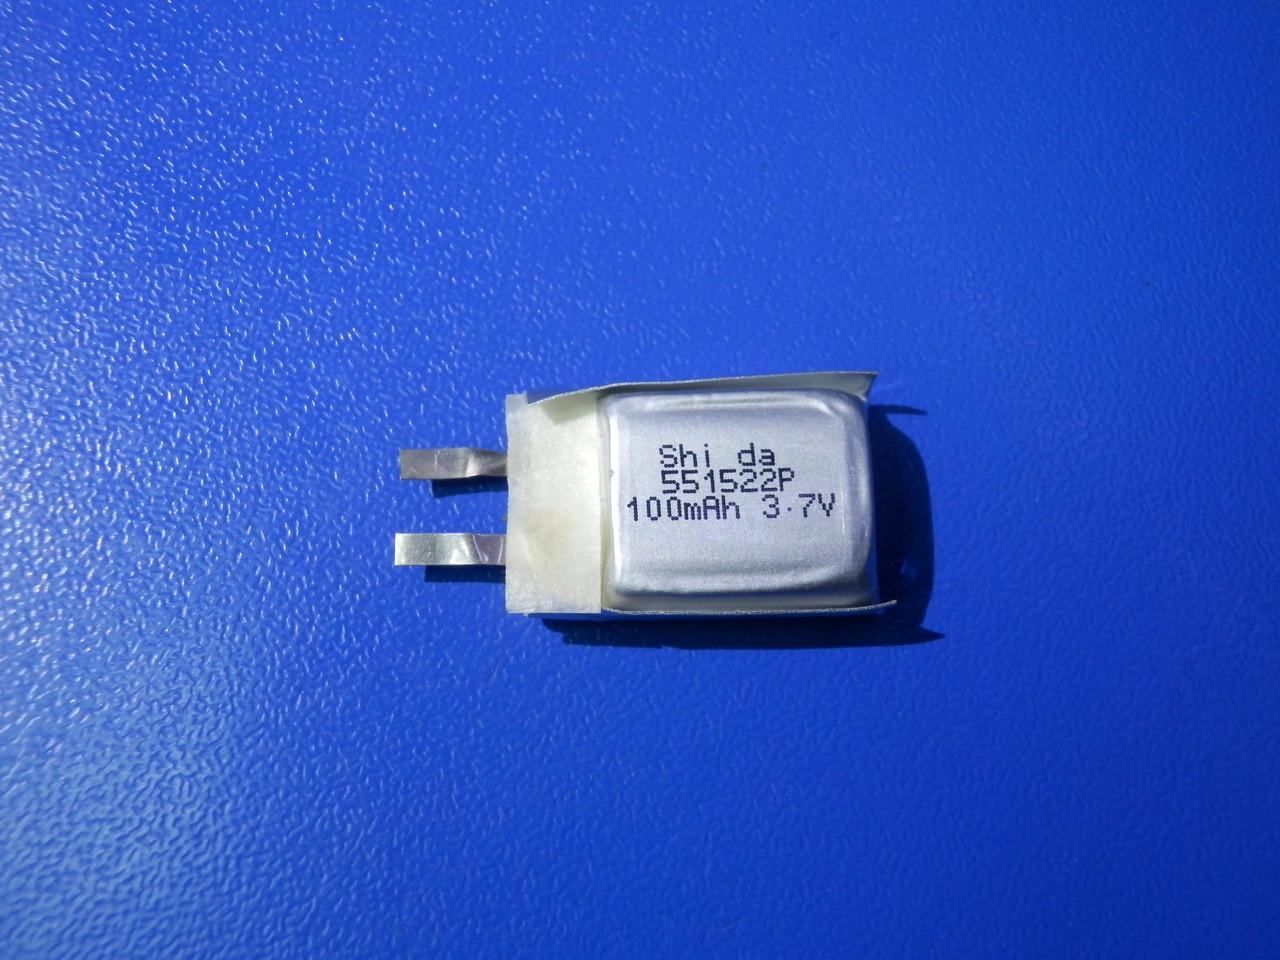 Акумулятор Li-pol Shida 551522P 3,7 v 100mAh